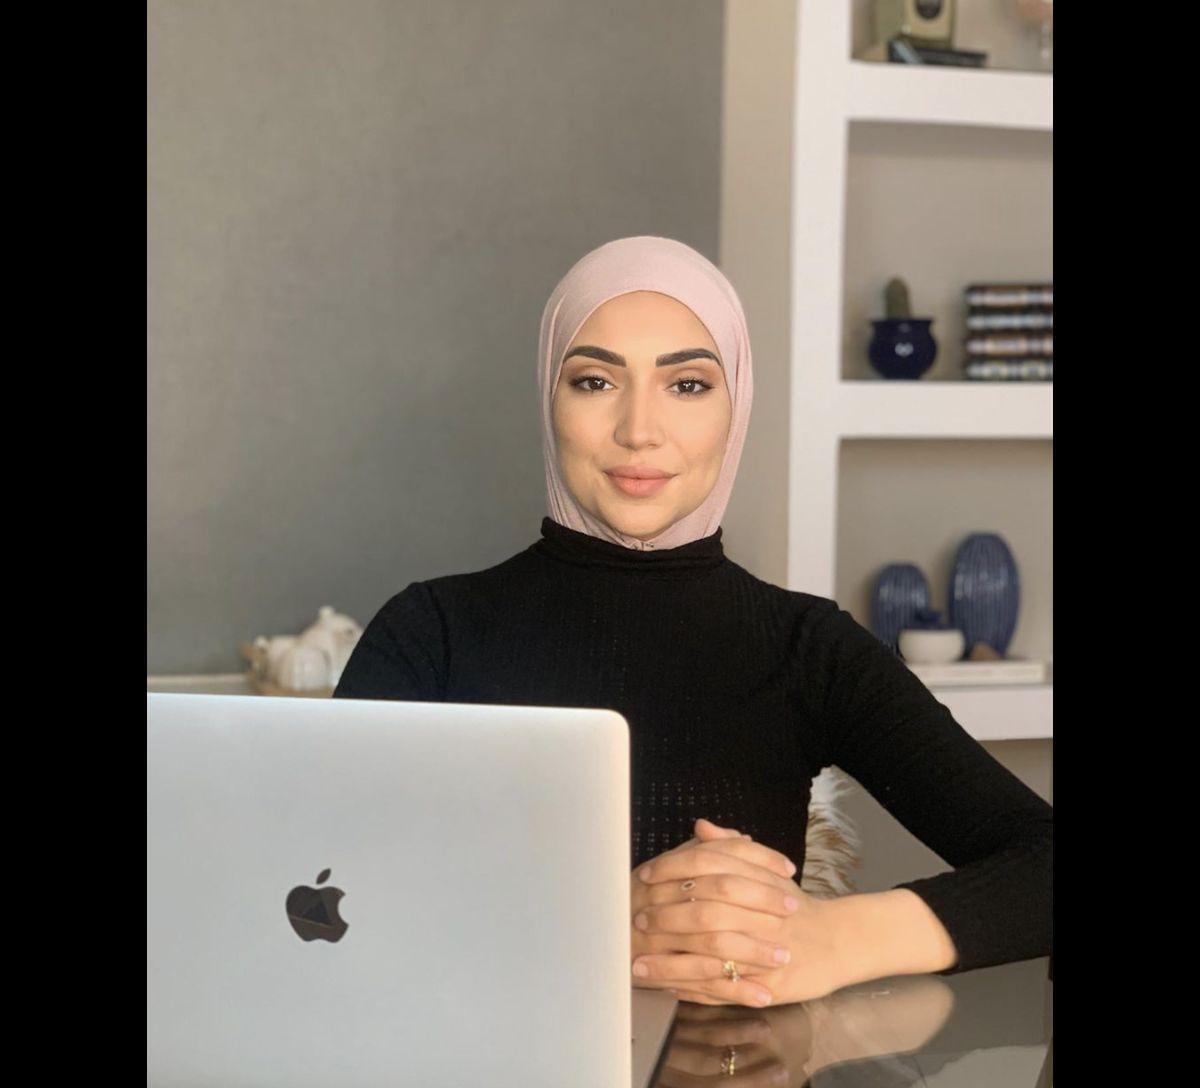 Enquete Exclusive Une Youtubeuse Scandalisee Denonce Une Censure Purepeople